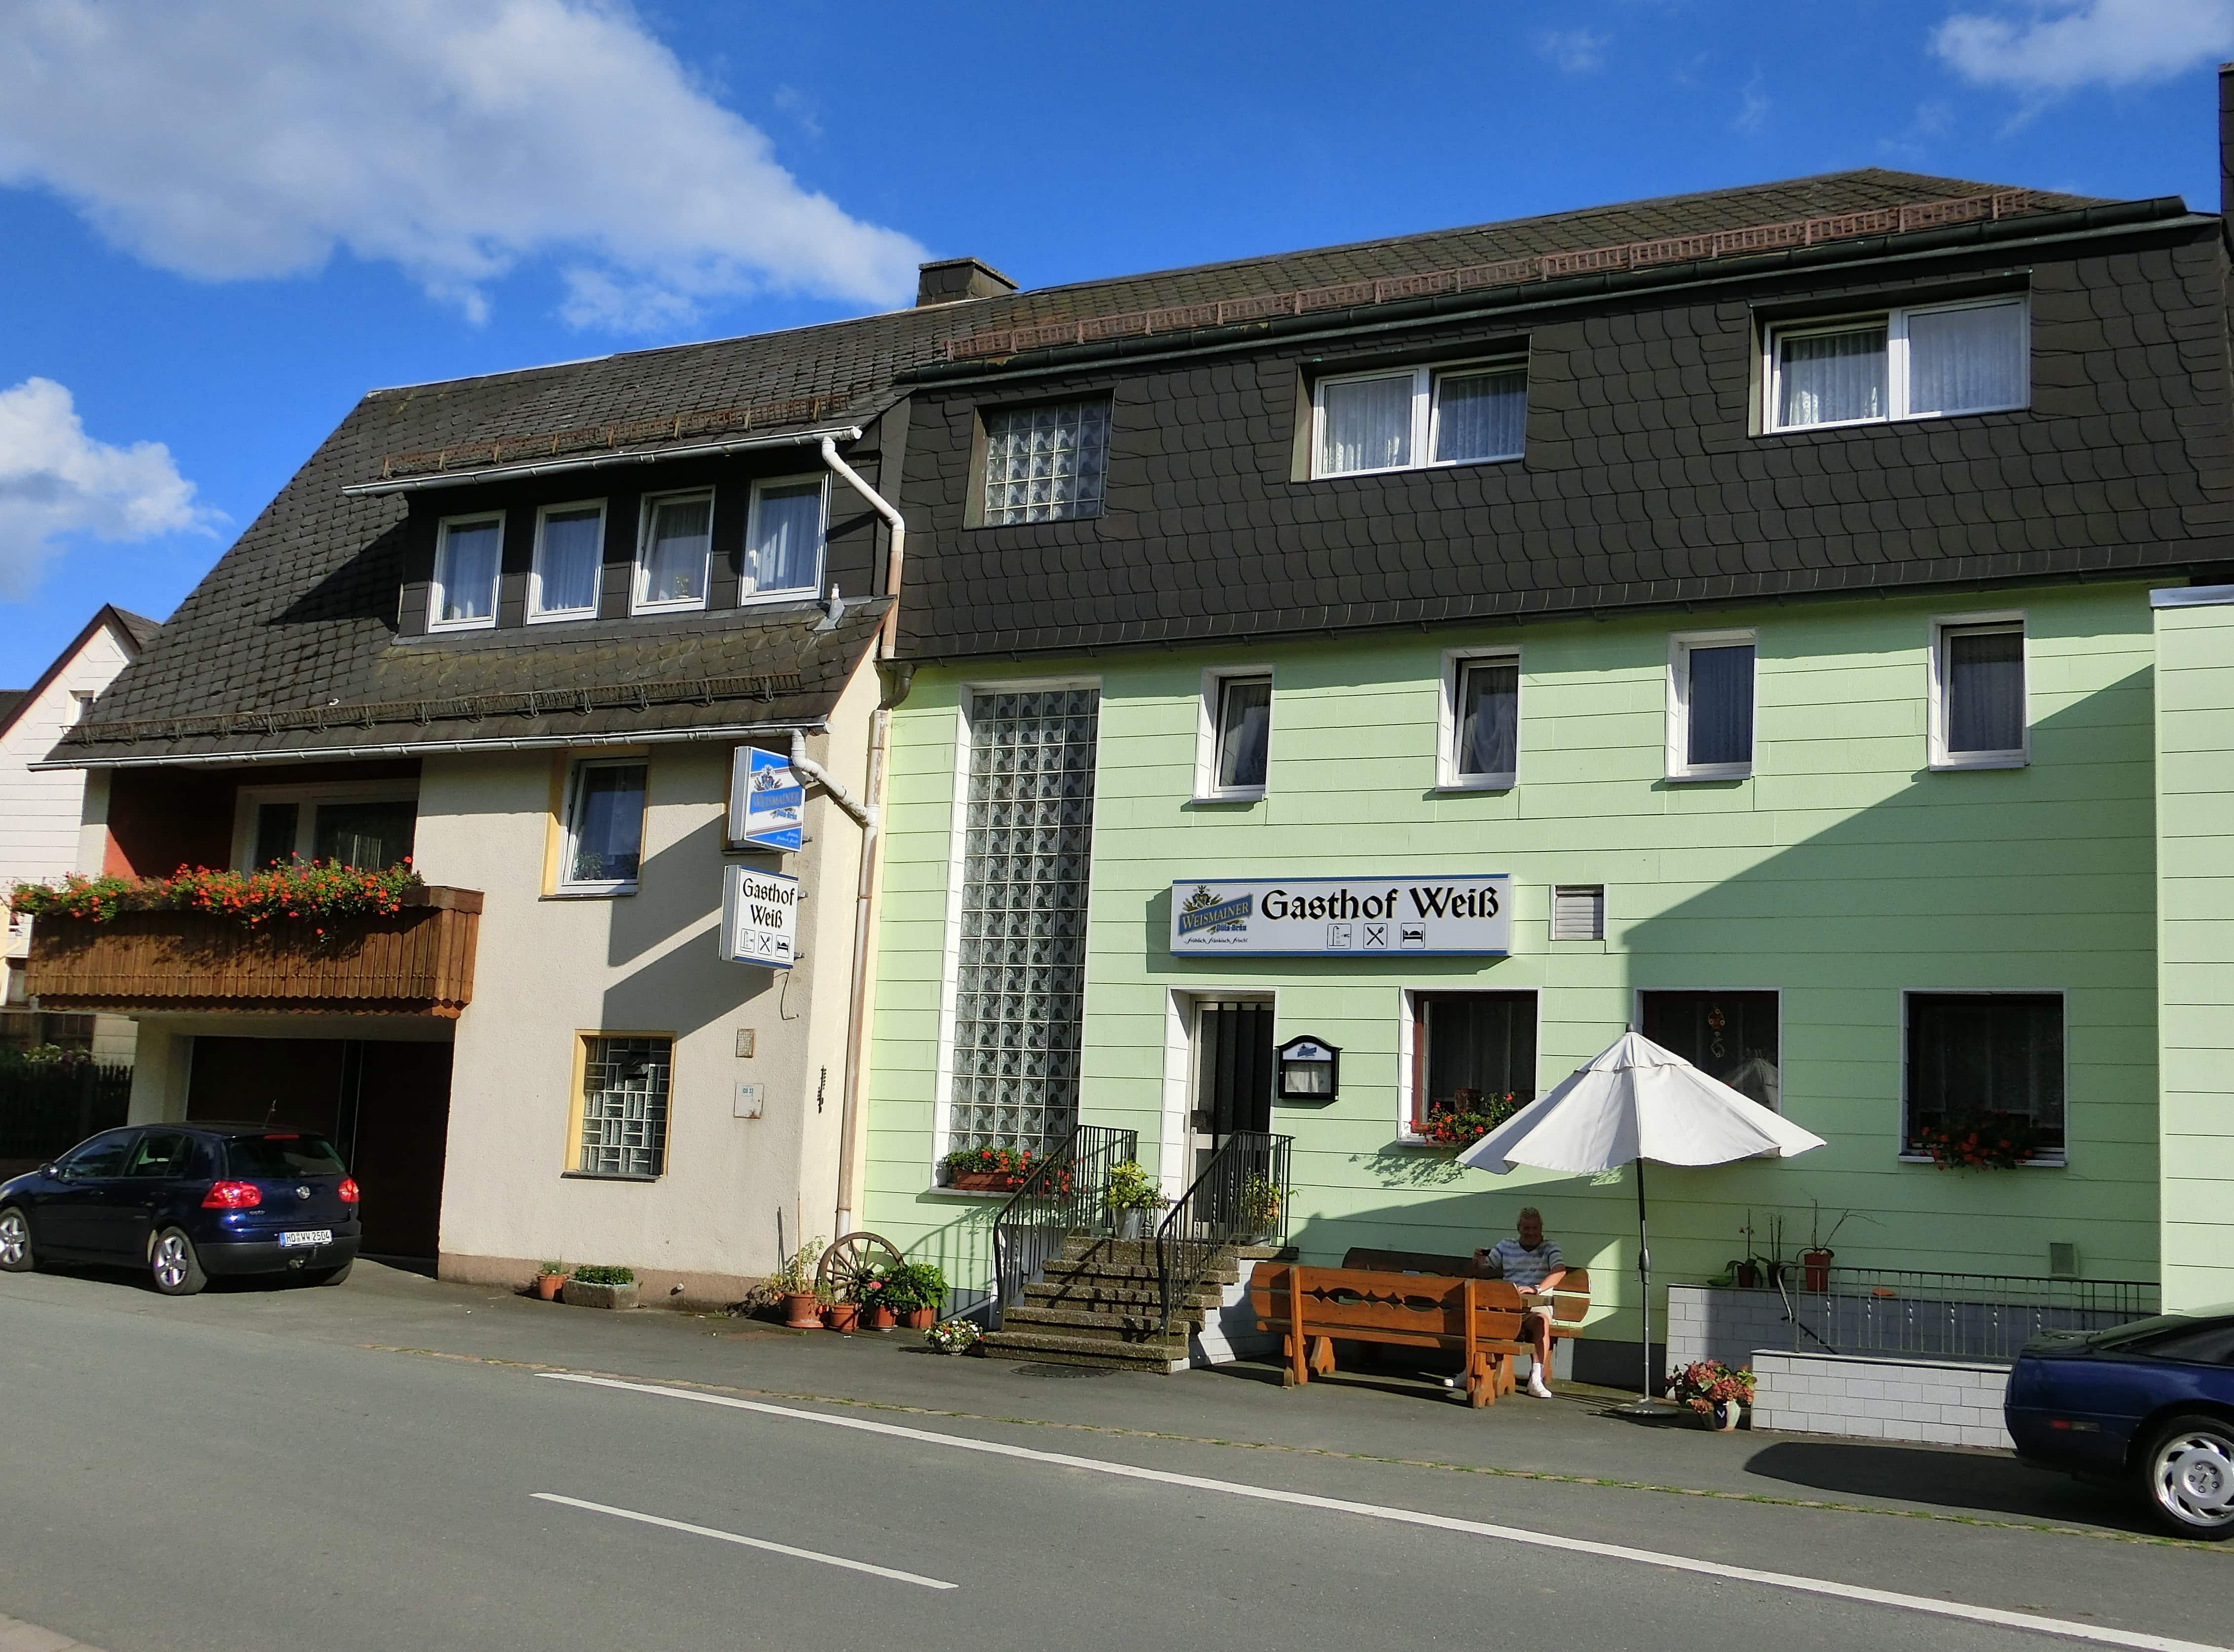 Gasthof Weiß